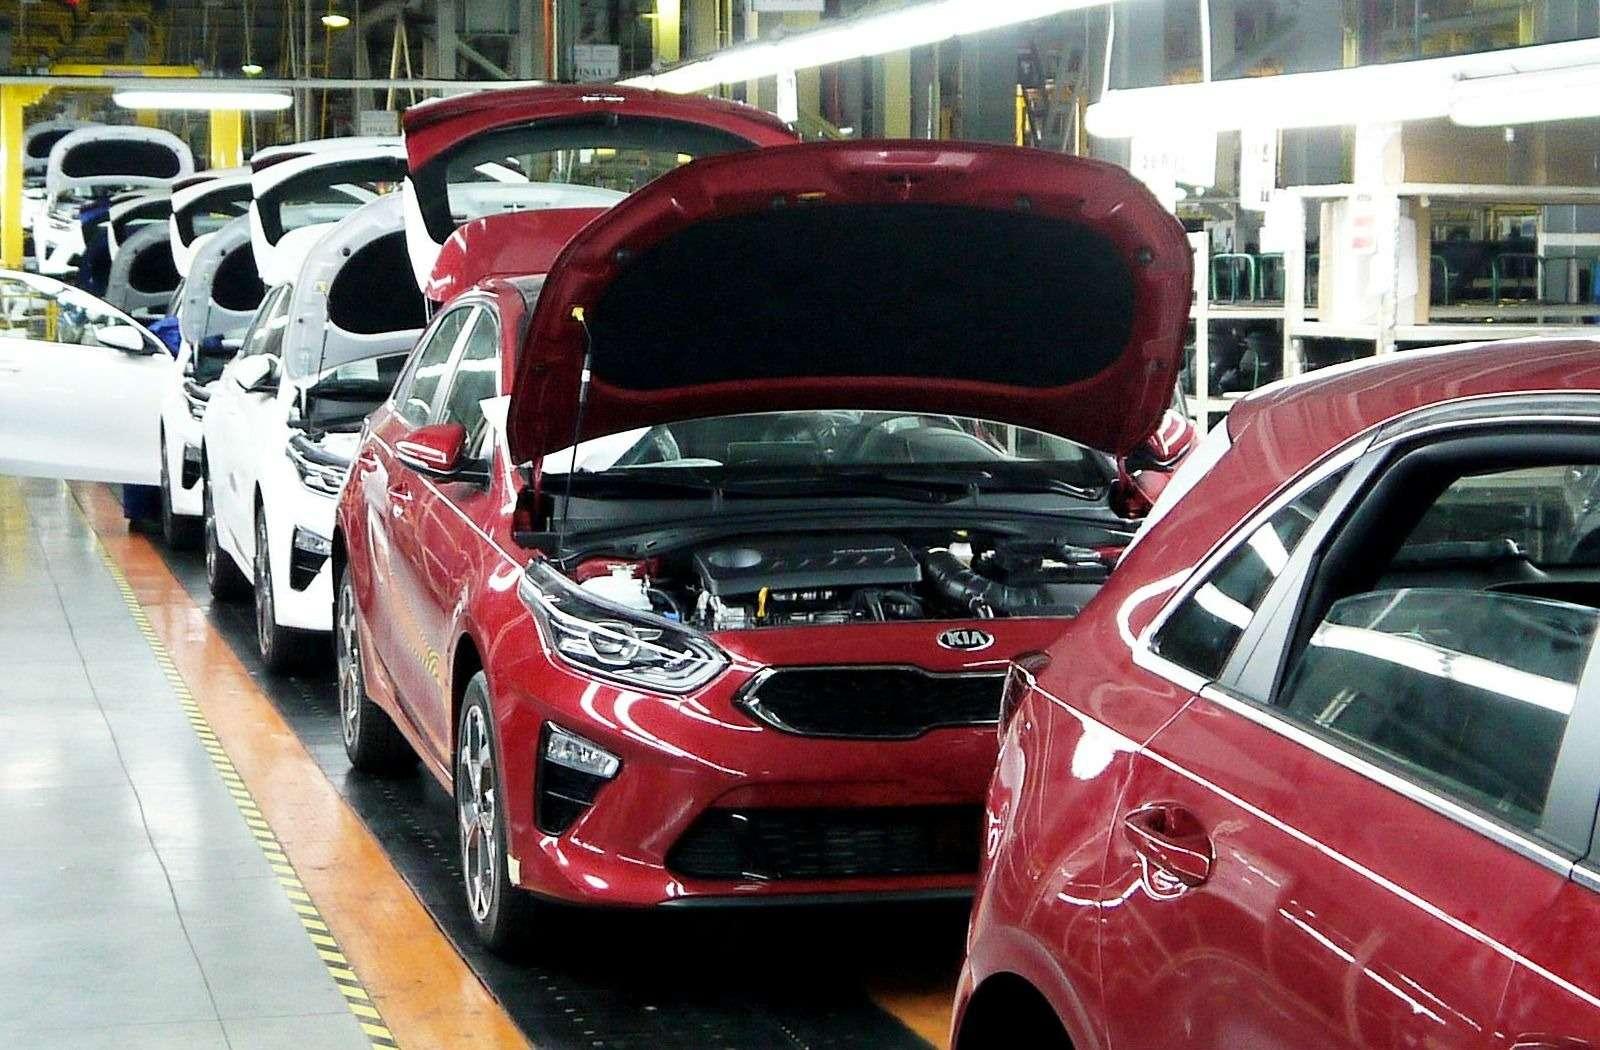 Новый Kia Ceed: началось производство вРоссии. Цен пока нет— фото 887510